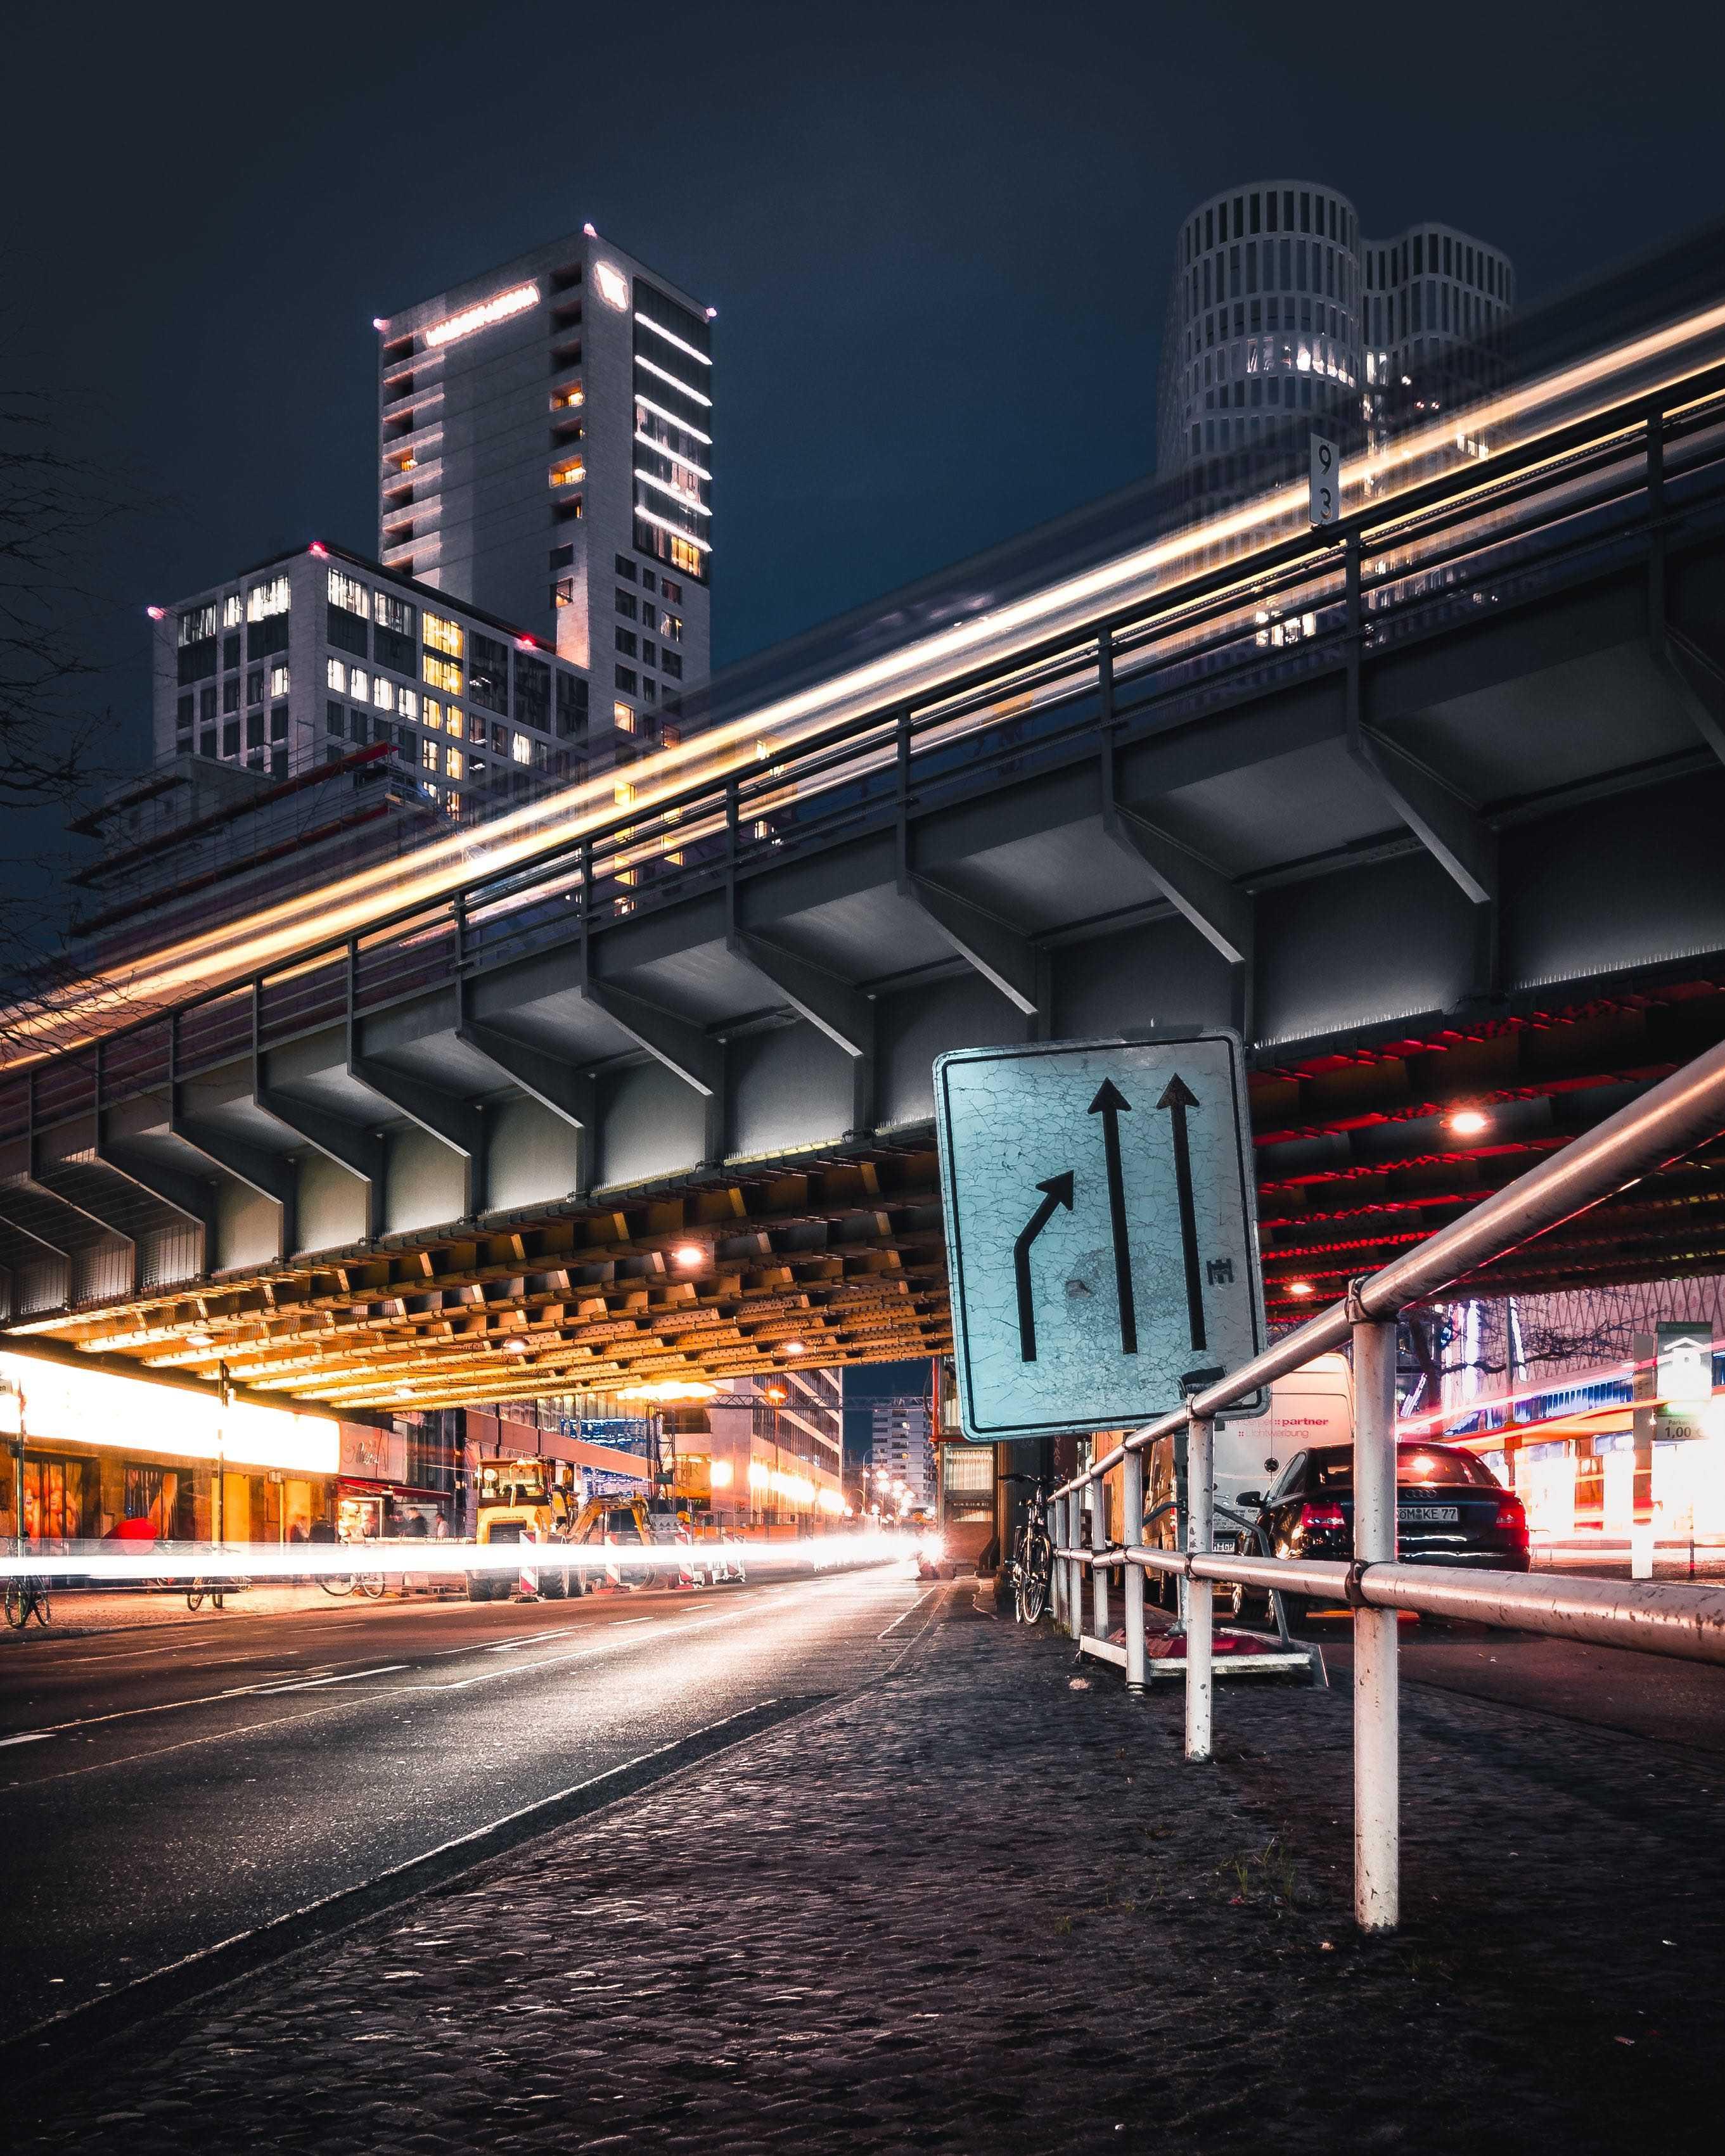 Fahrerflucht Straßenverkehr Straße Berlin